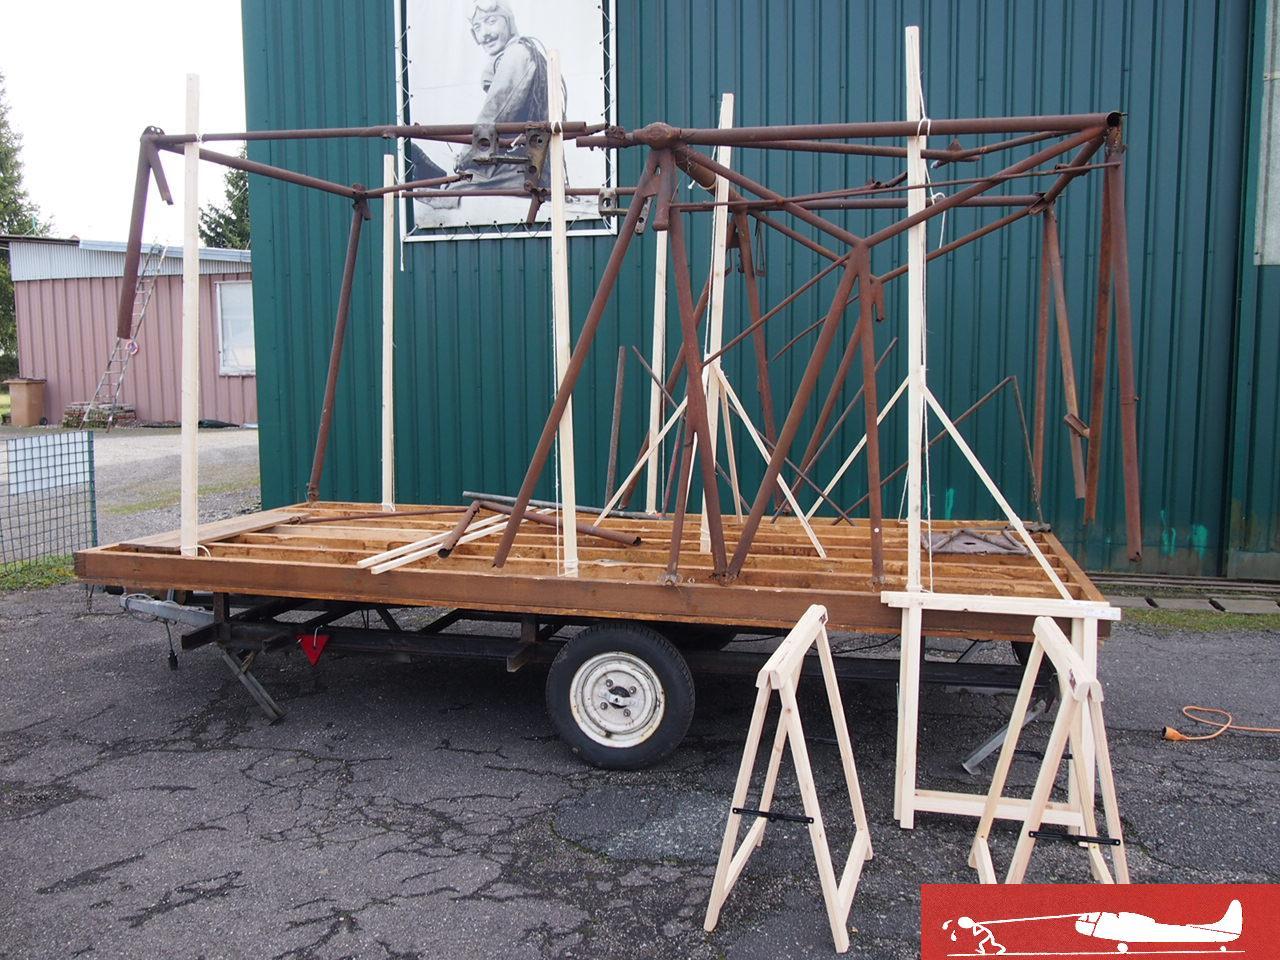 [Gliderborne] Restauration planeur WACO CG-4A P3219003